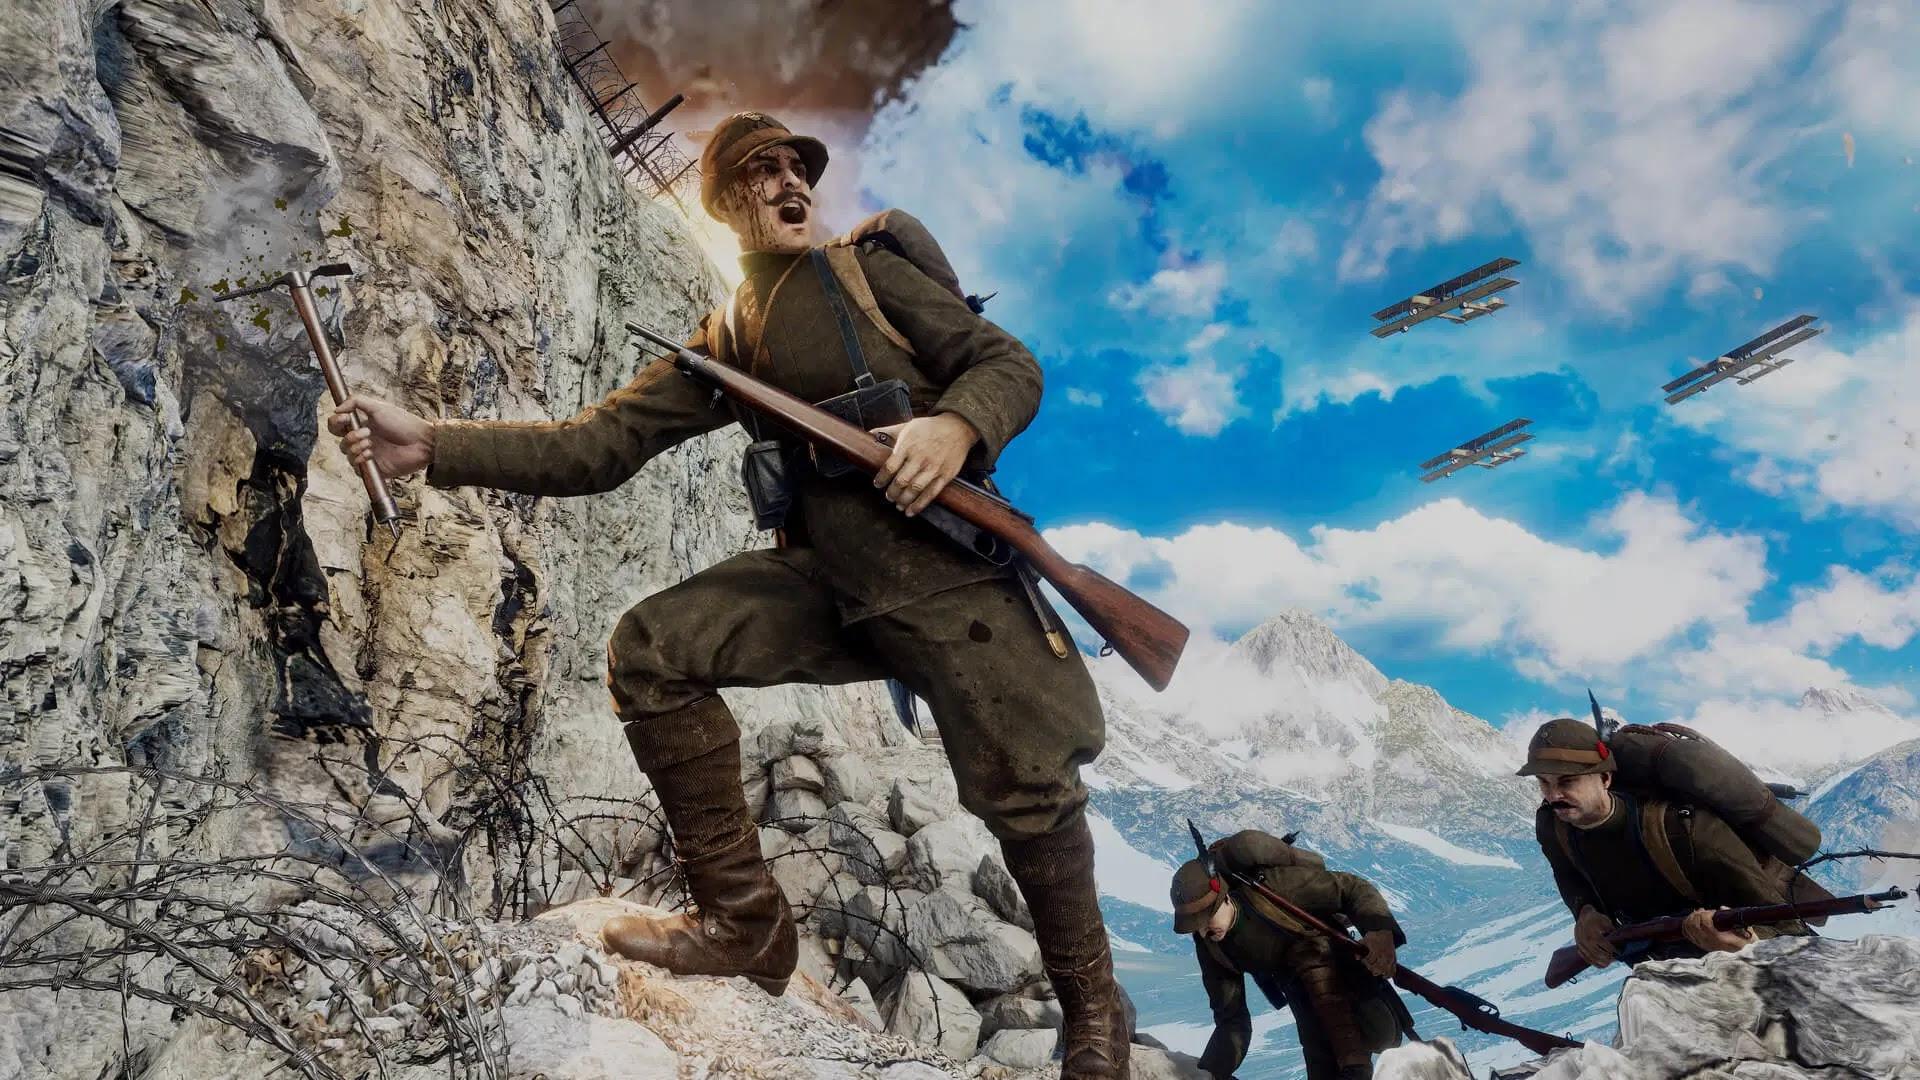 Isonzo Game